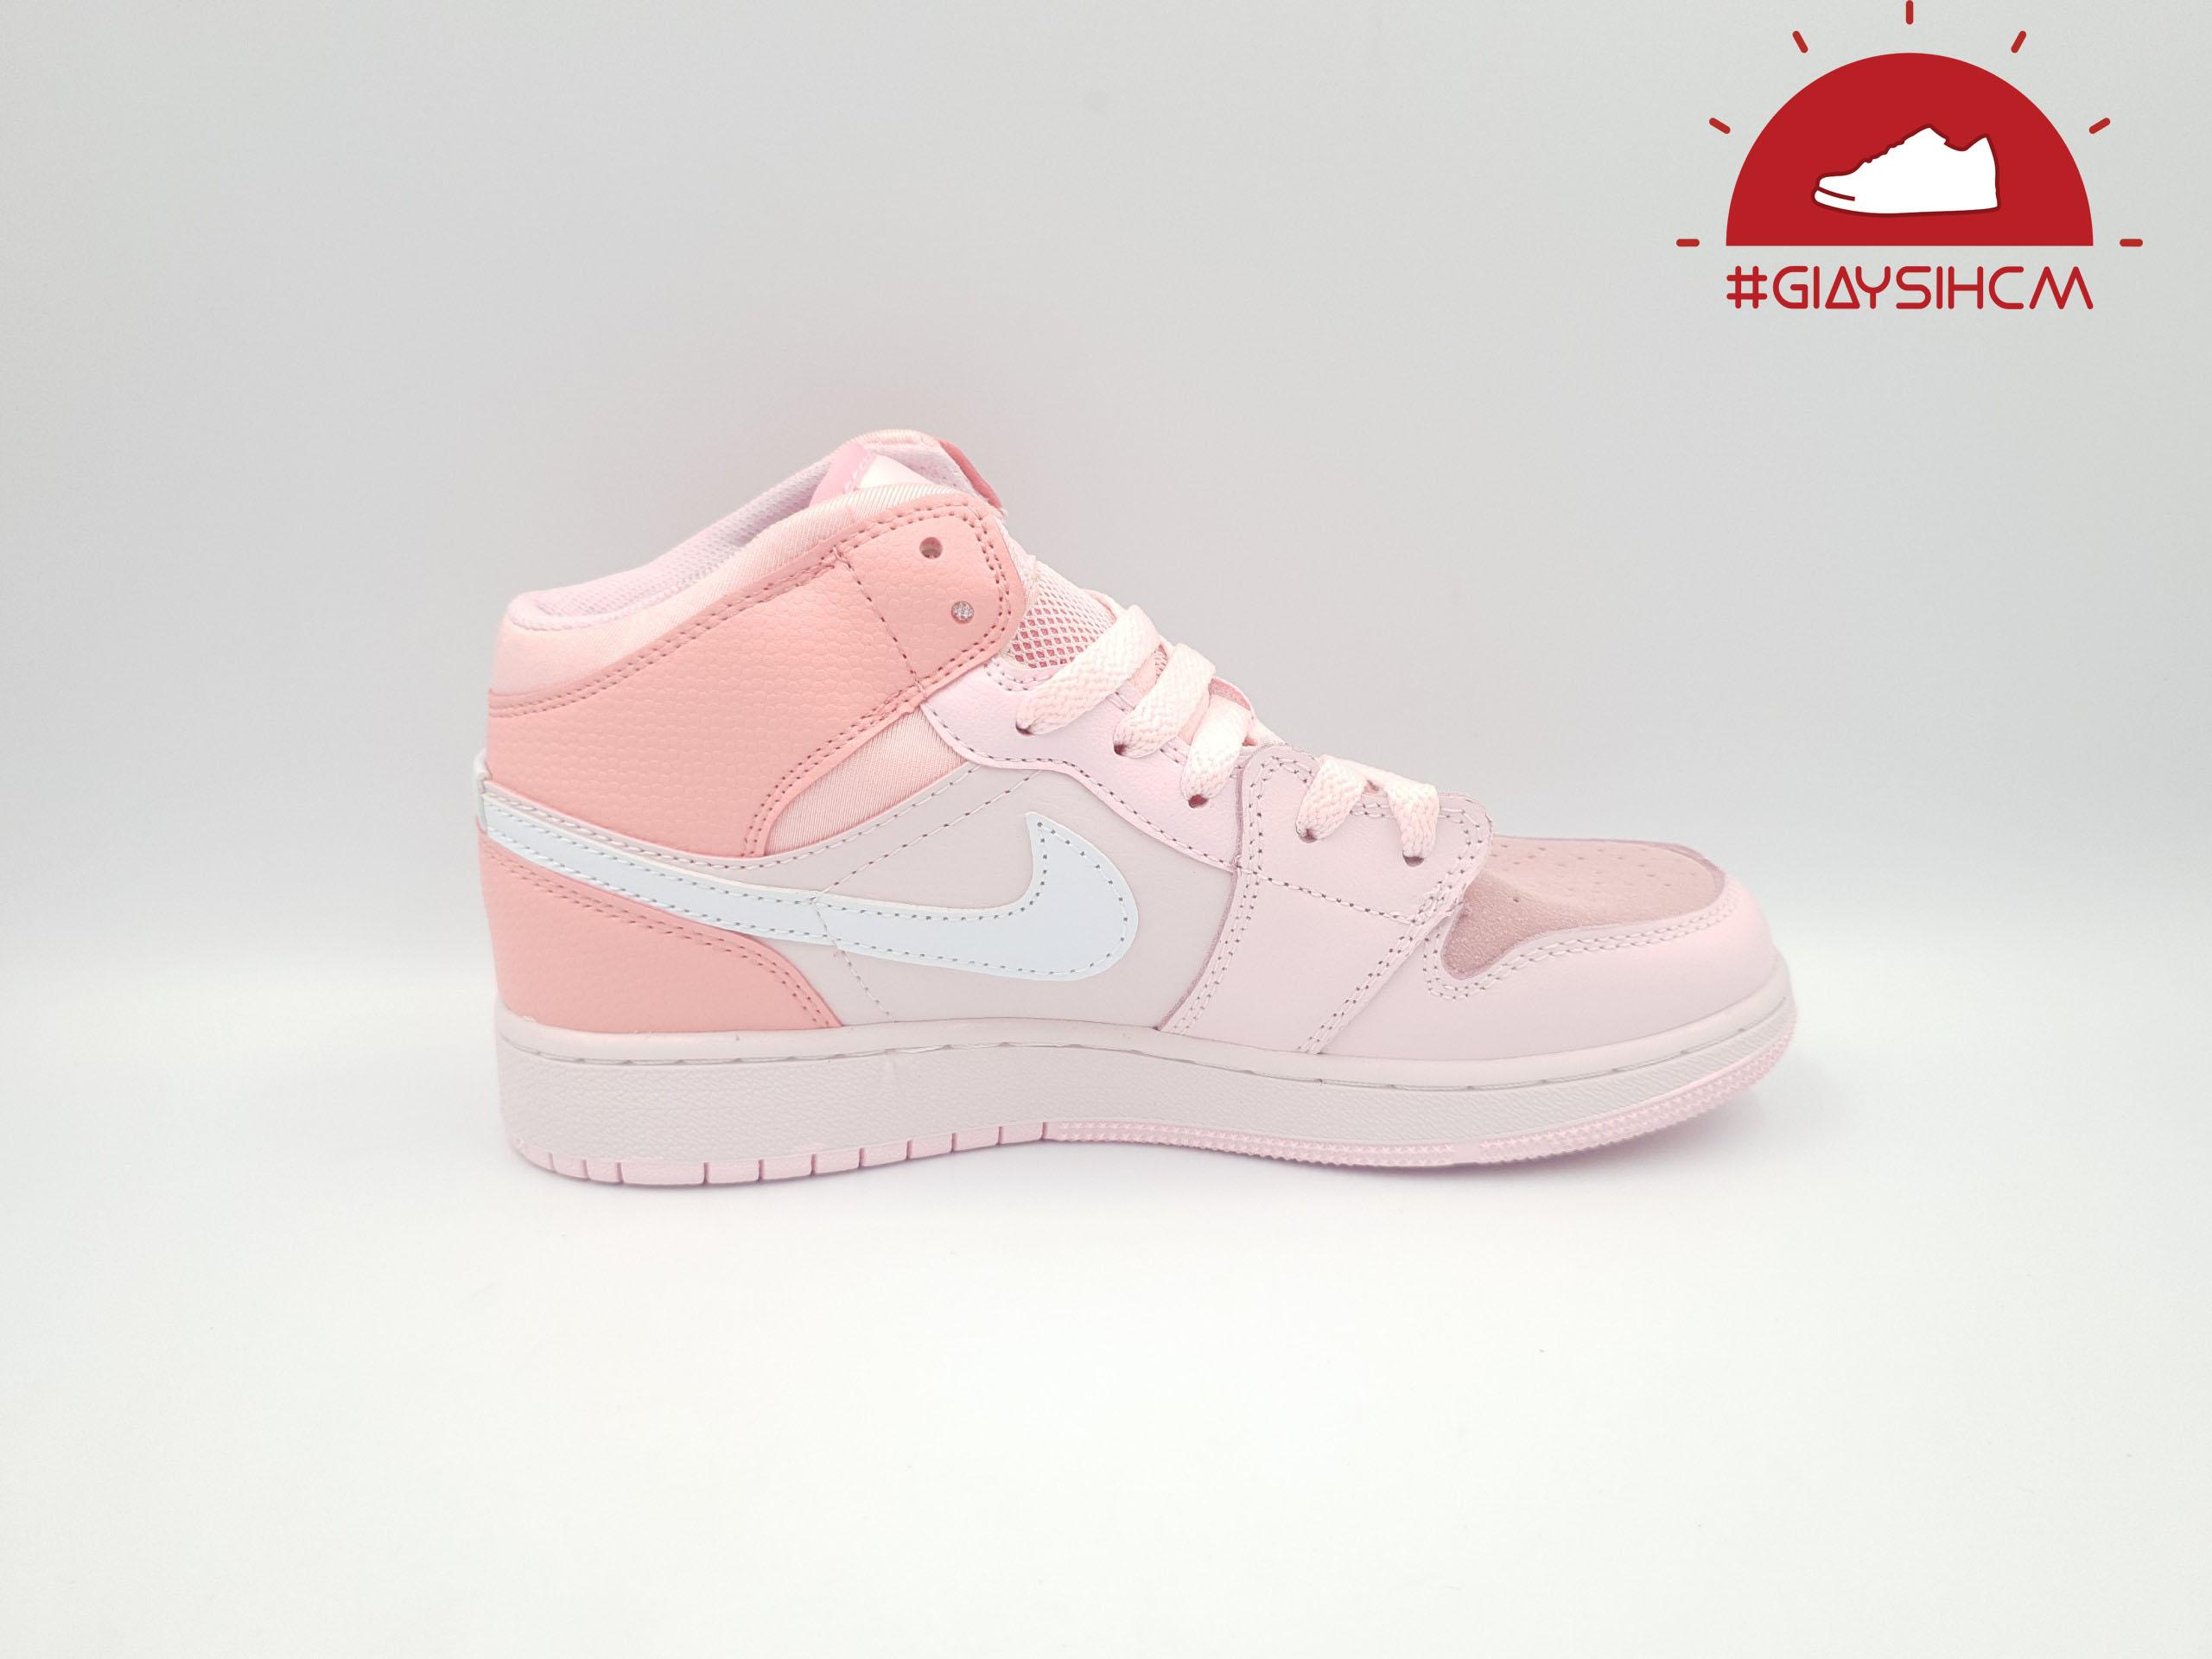 jordan-1-high-mid-digital-pink